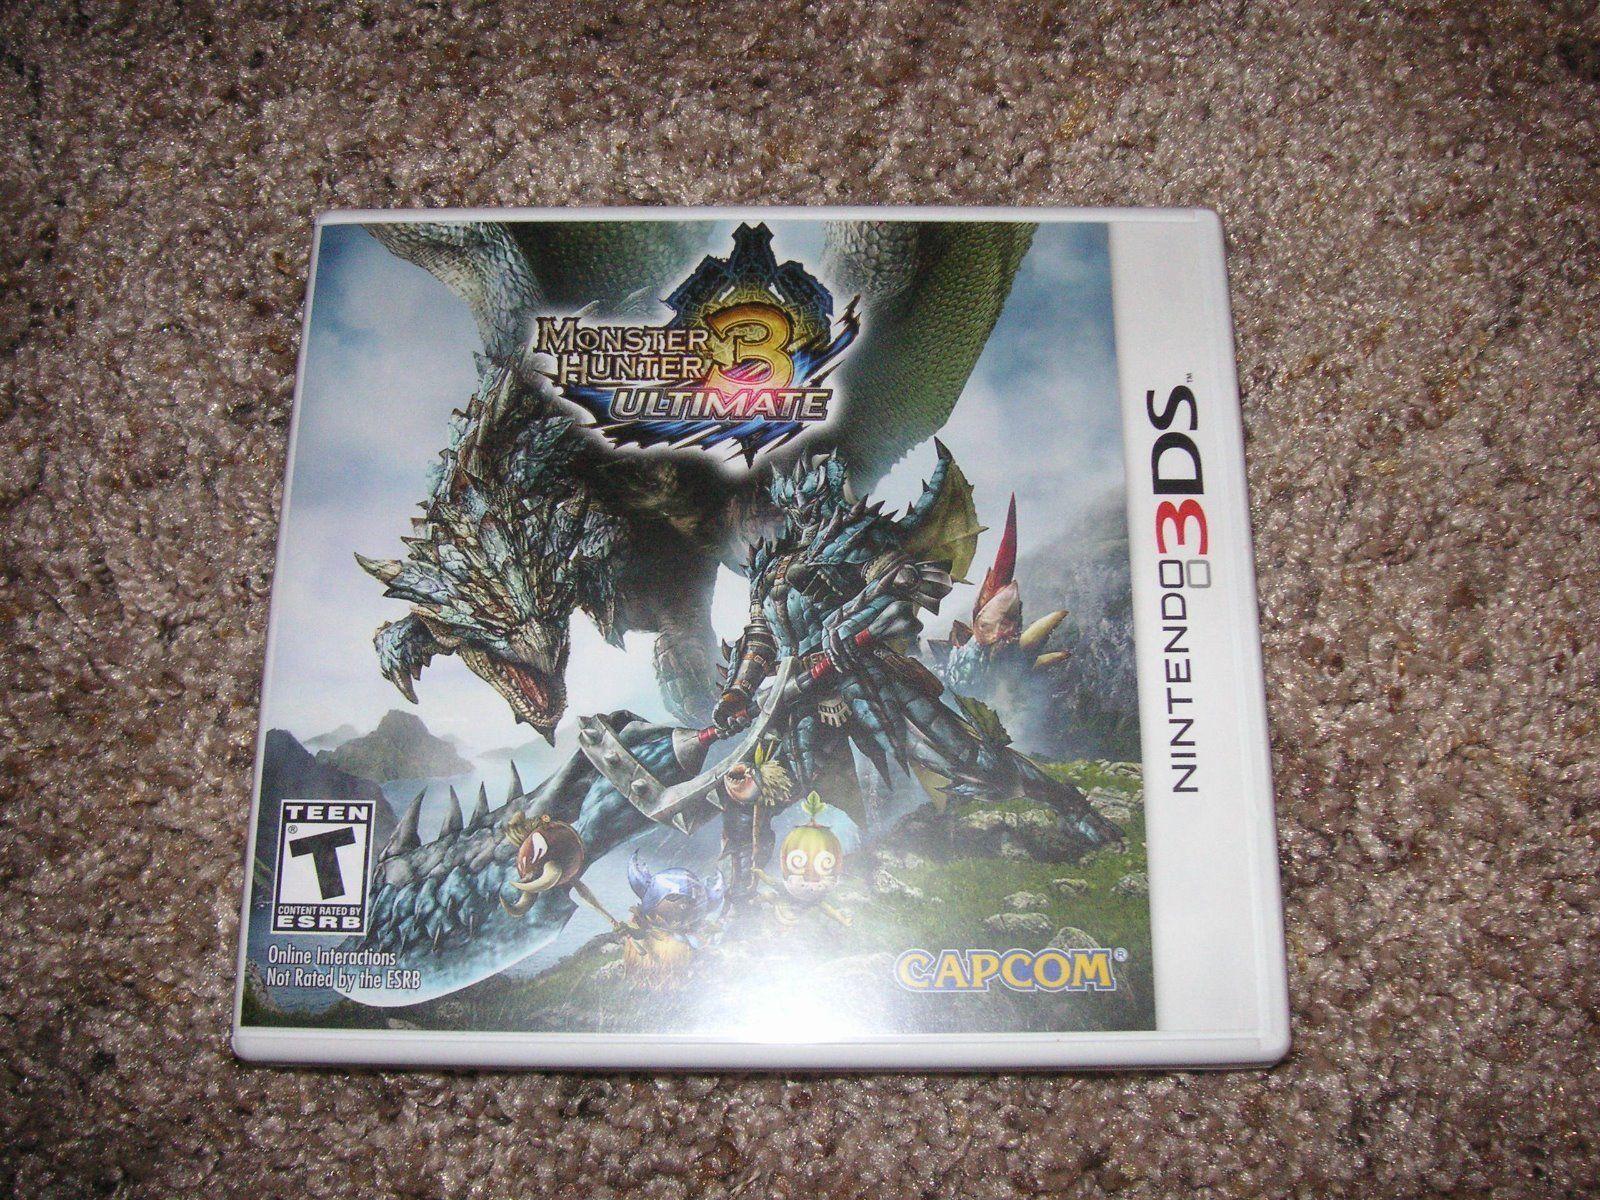 Monster Hunter 3 Ultimate Nintendo 3DS Video Game